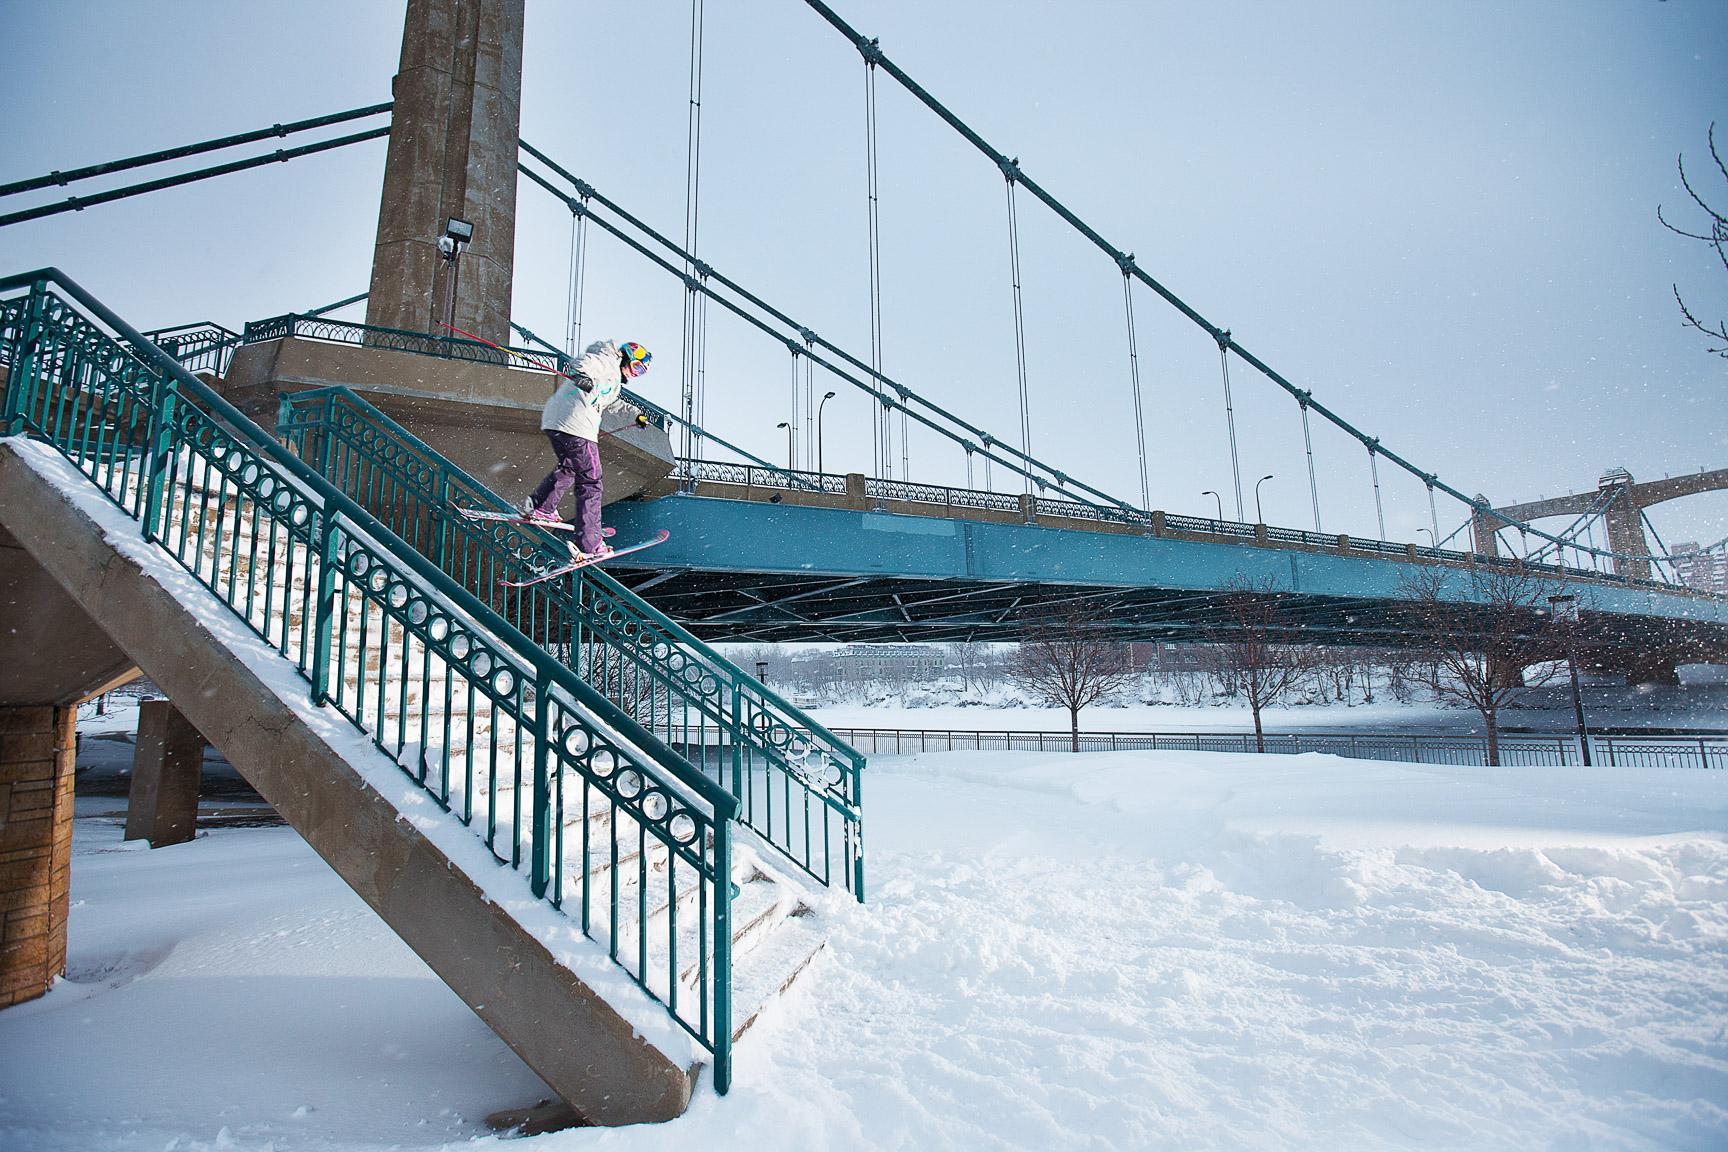 Grete Eliassen, Minneapolis, Minnesota